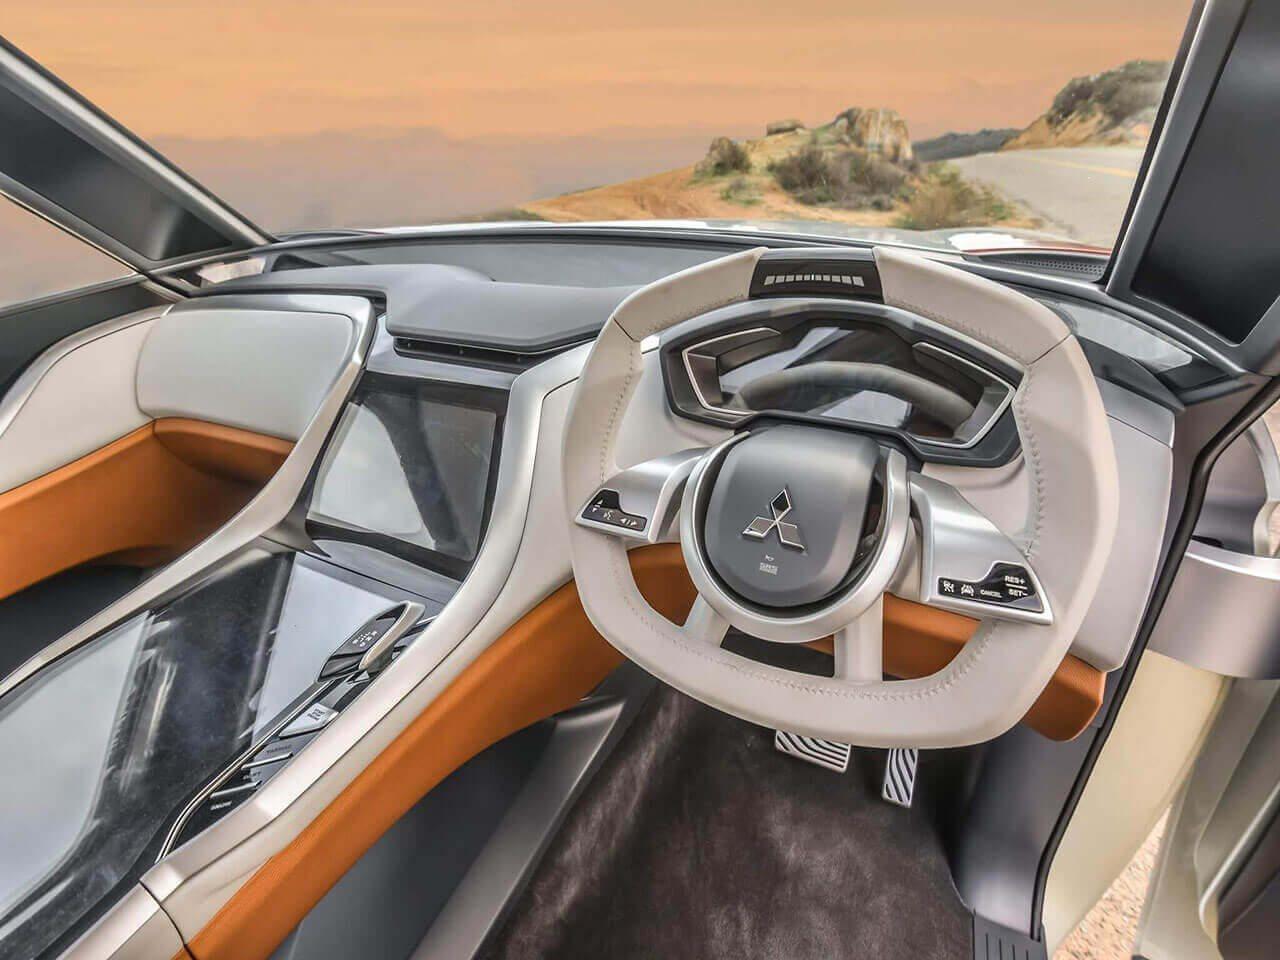 2017 mitsubishi montero futuristic suv from rising sun country might get hybrid engine. Black Bedroom Furniture Sets. Home Design Ideas